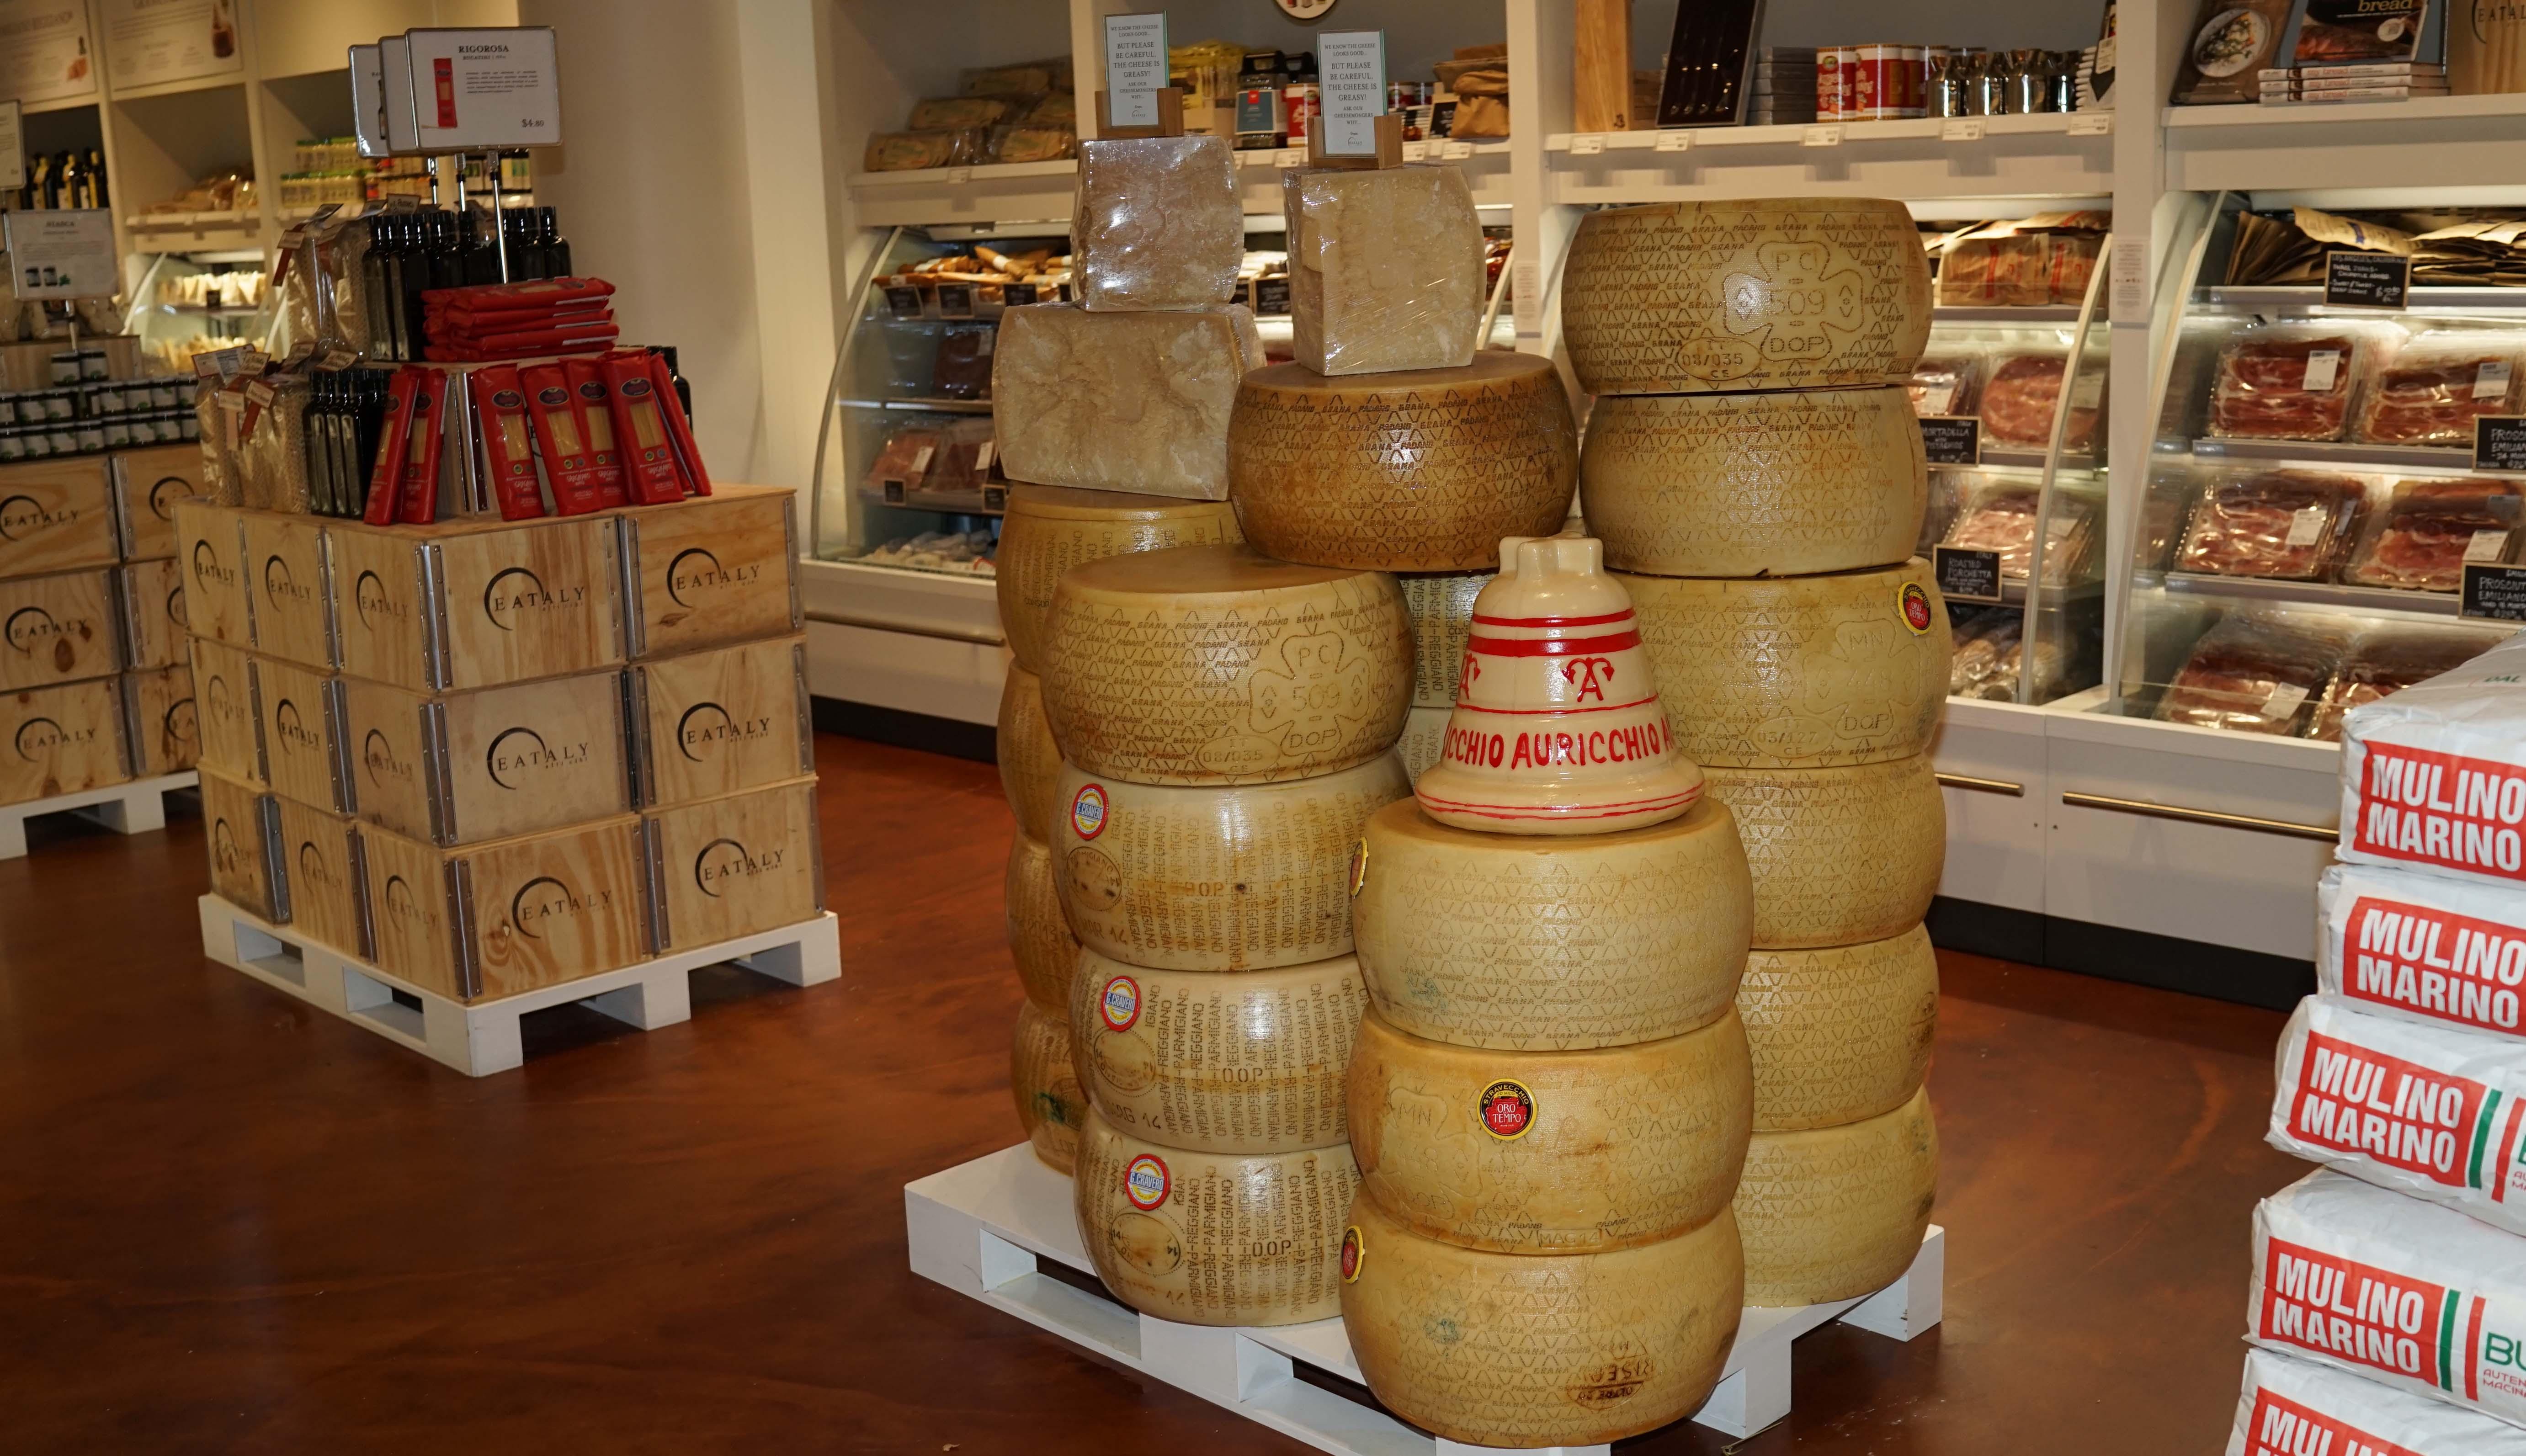 Eataly cheese wheel